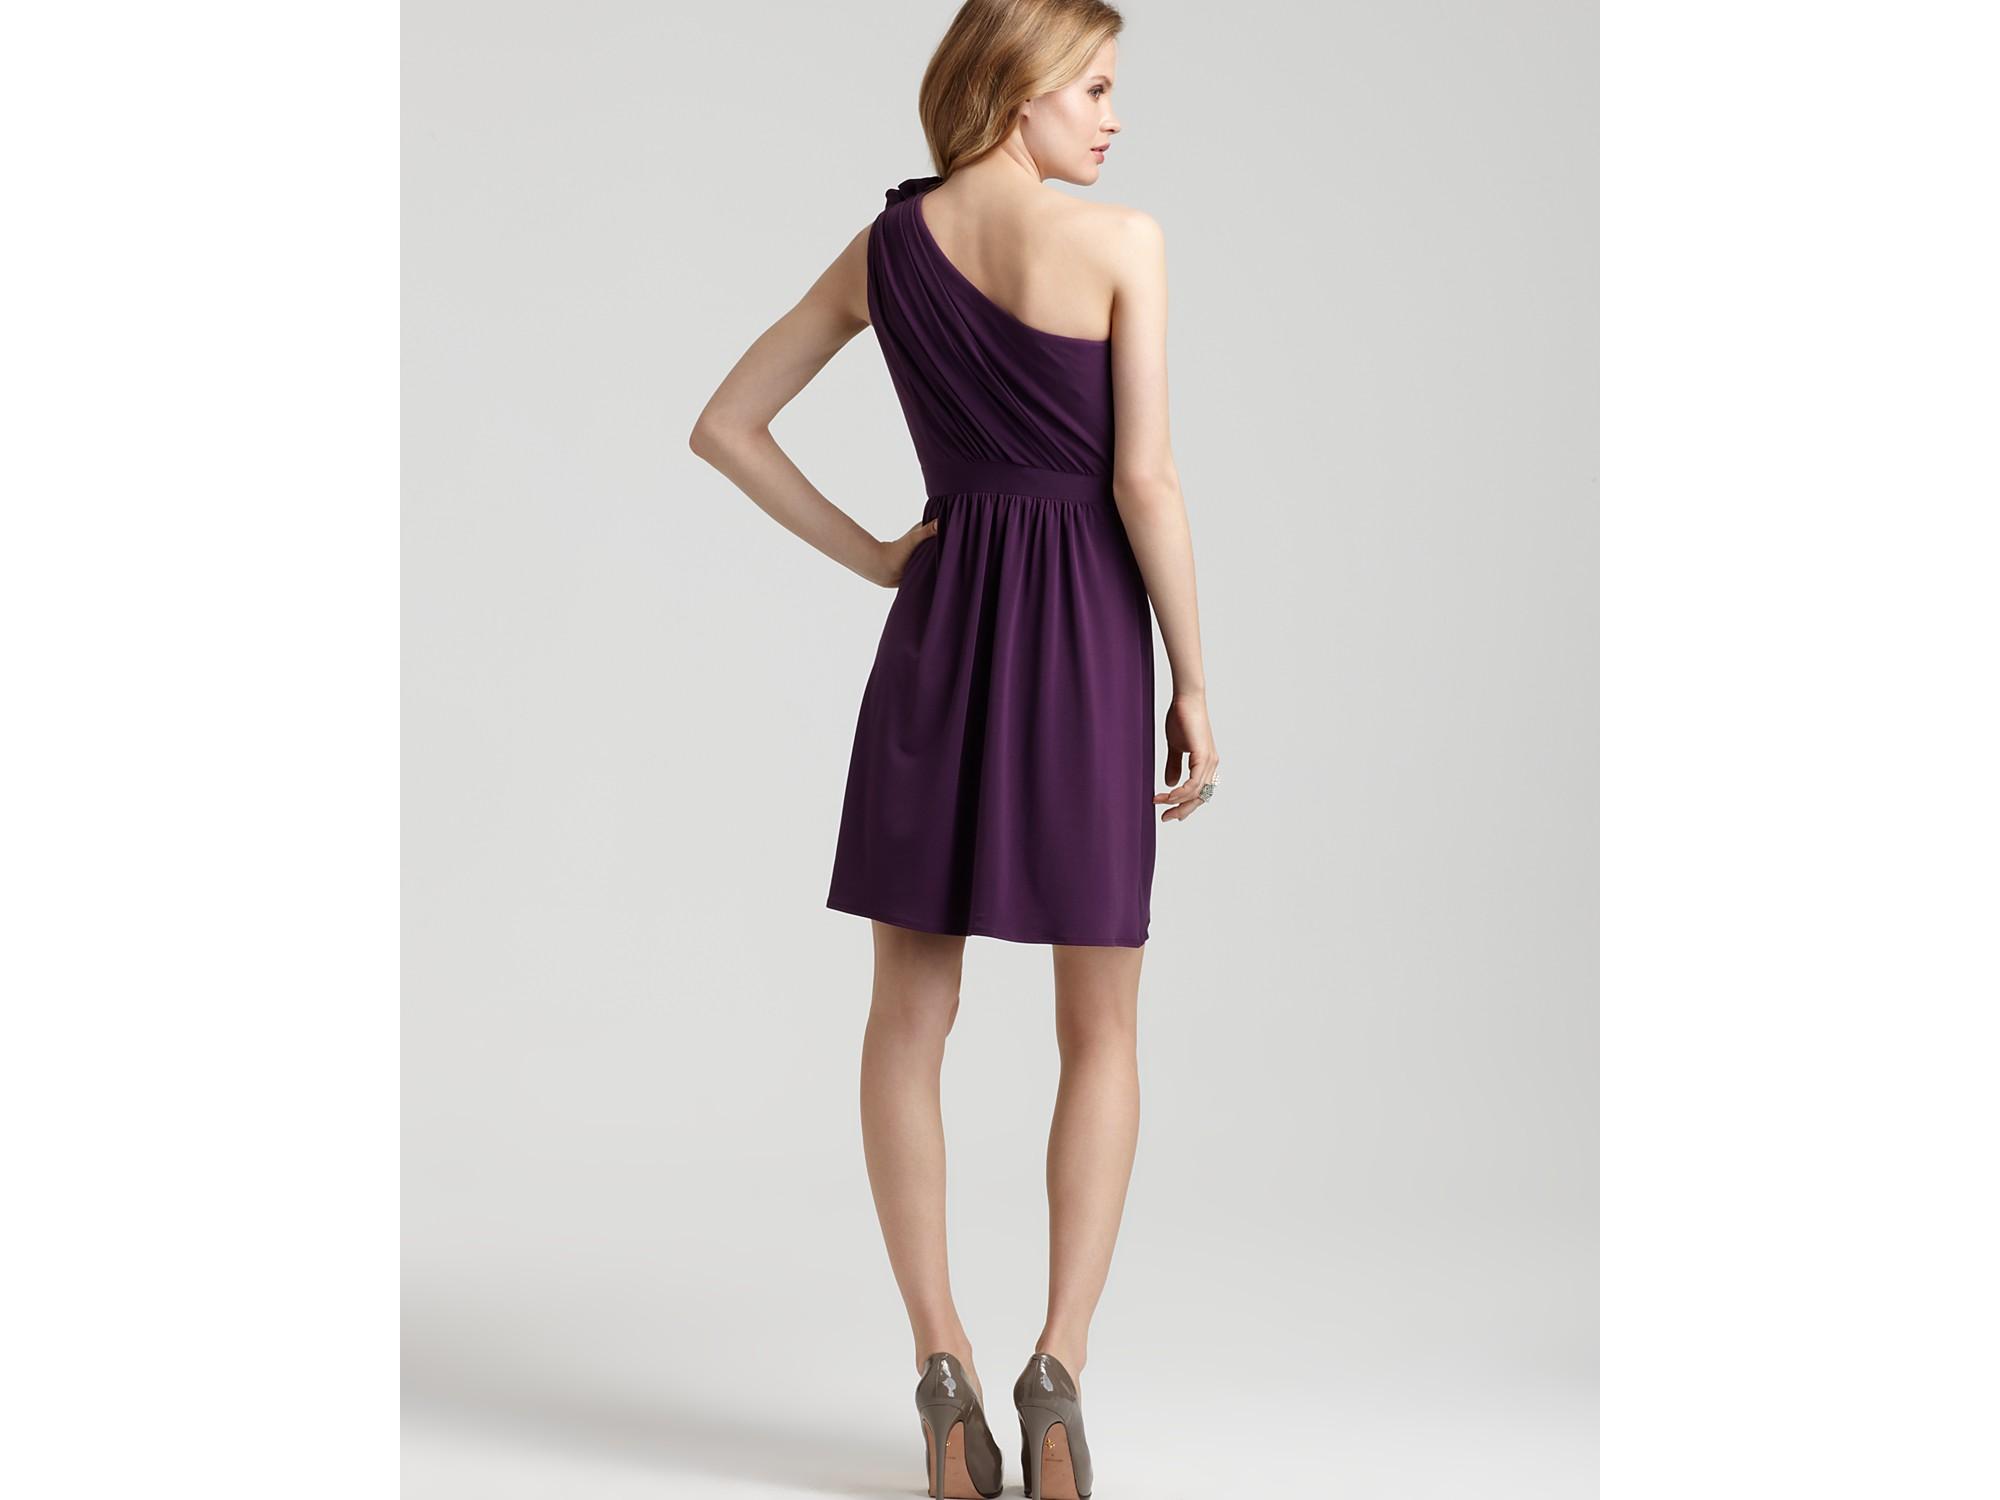 Lyst - Max & Cleo One-shoulder Ruffle Dress in Purple